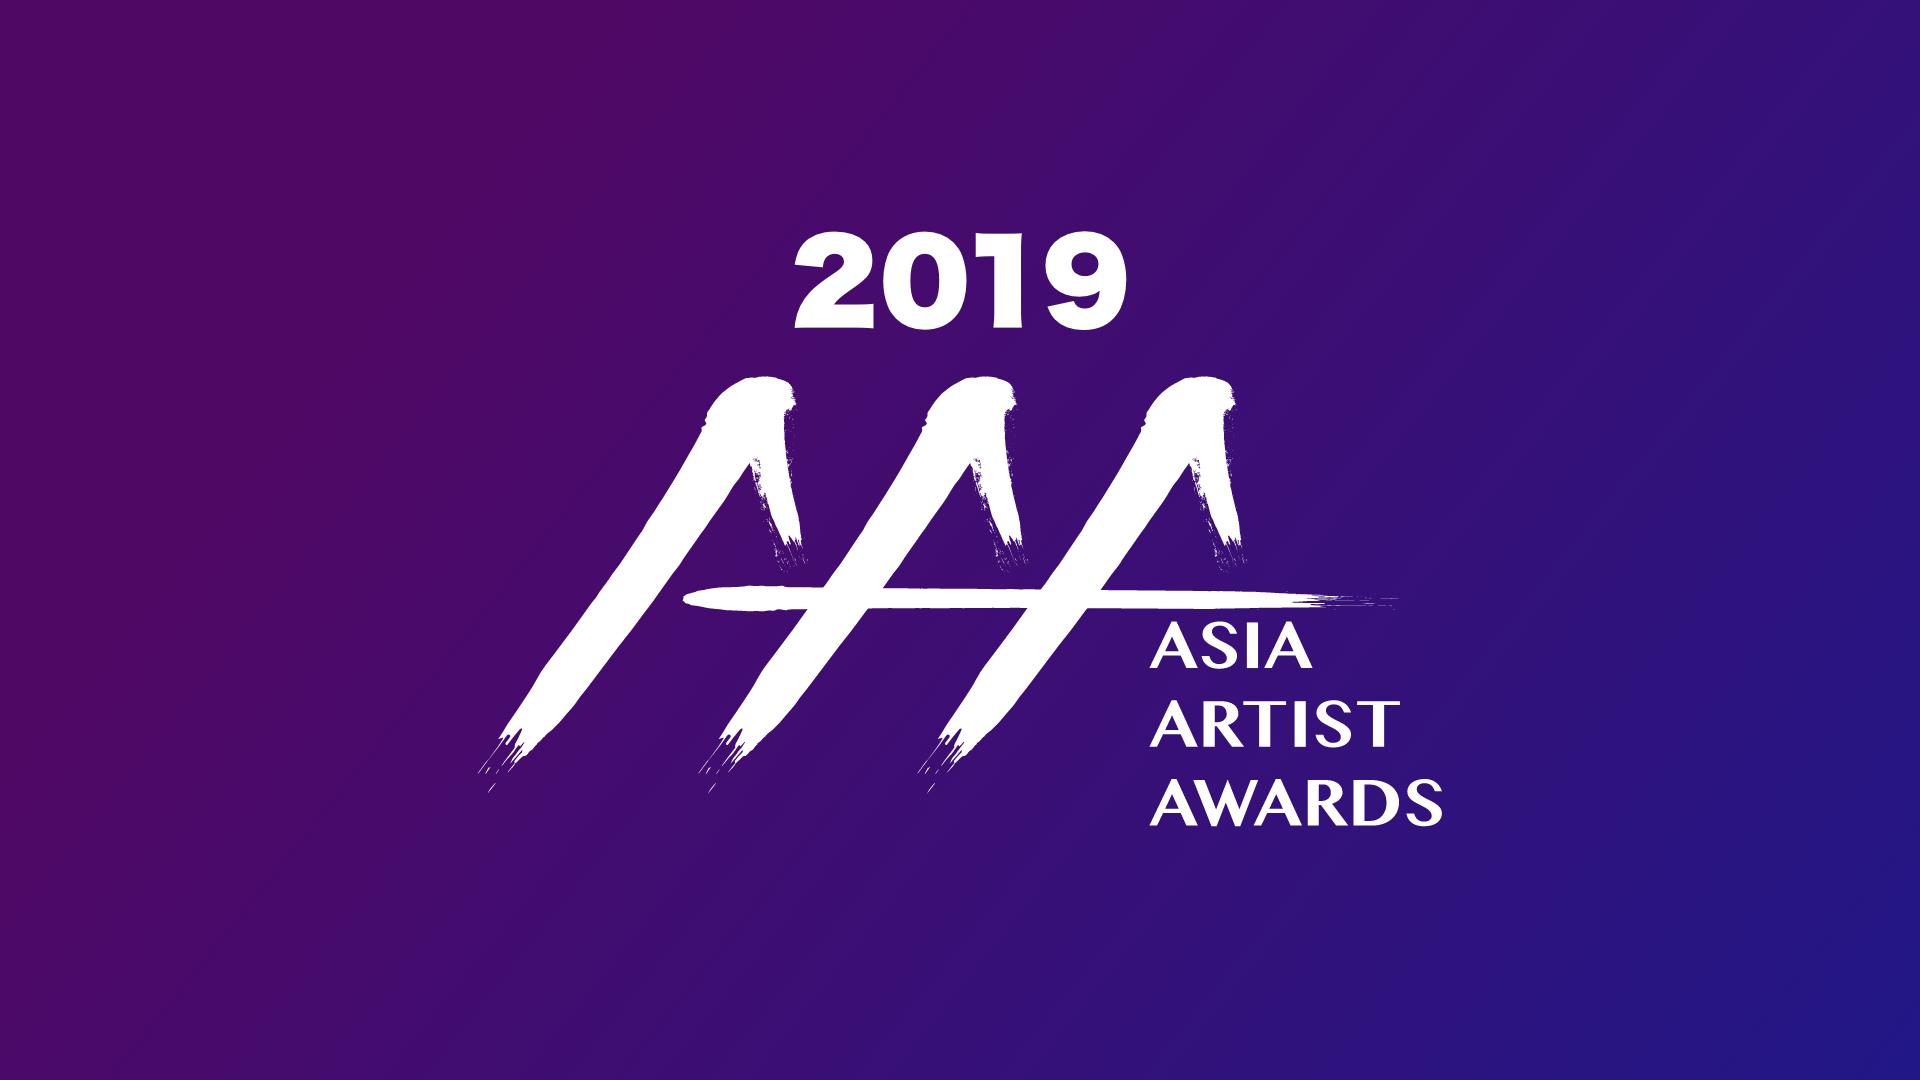 2019 ASIA ARTIST AWARDS in Vietnam